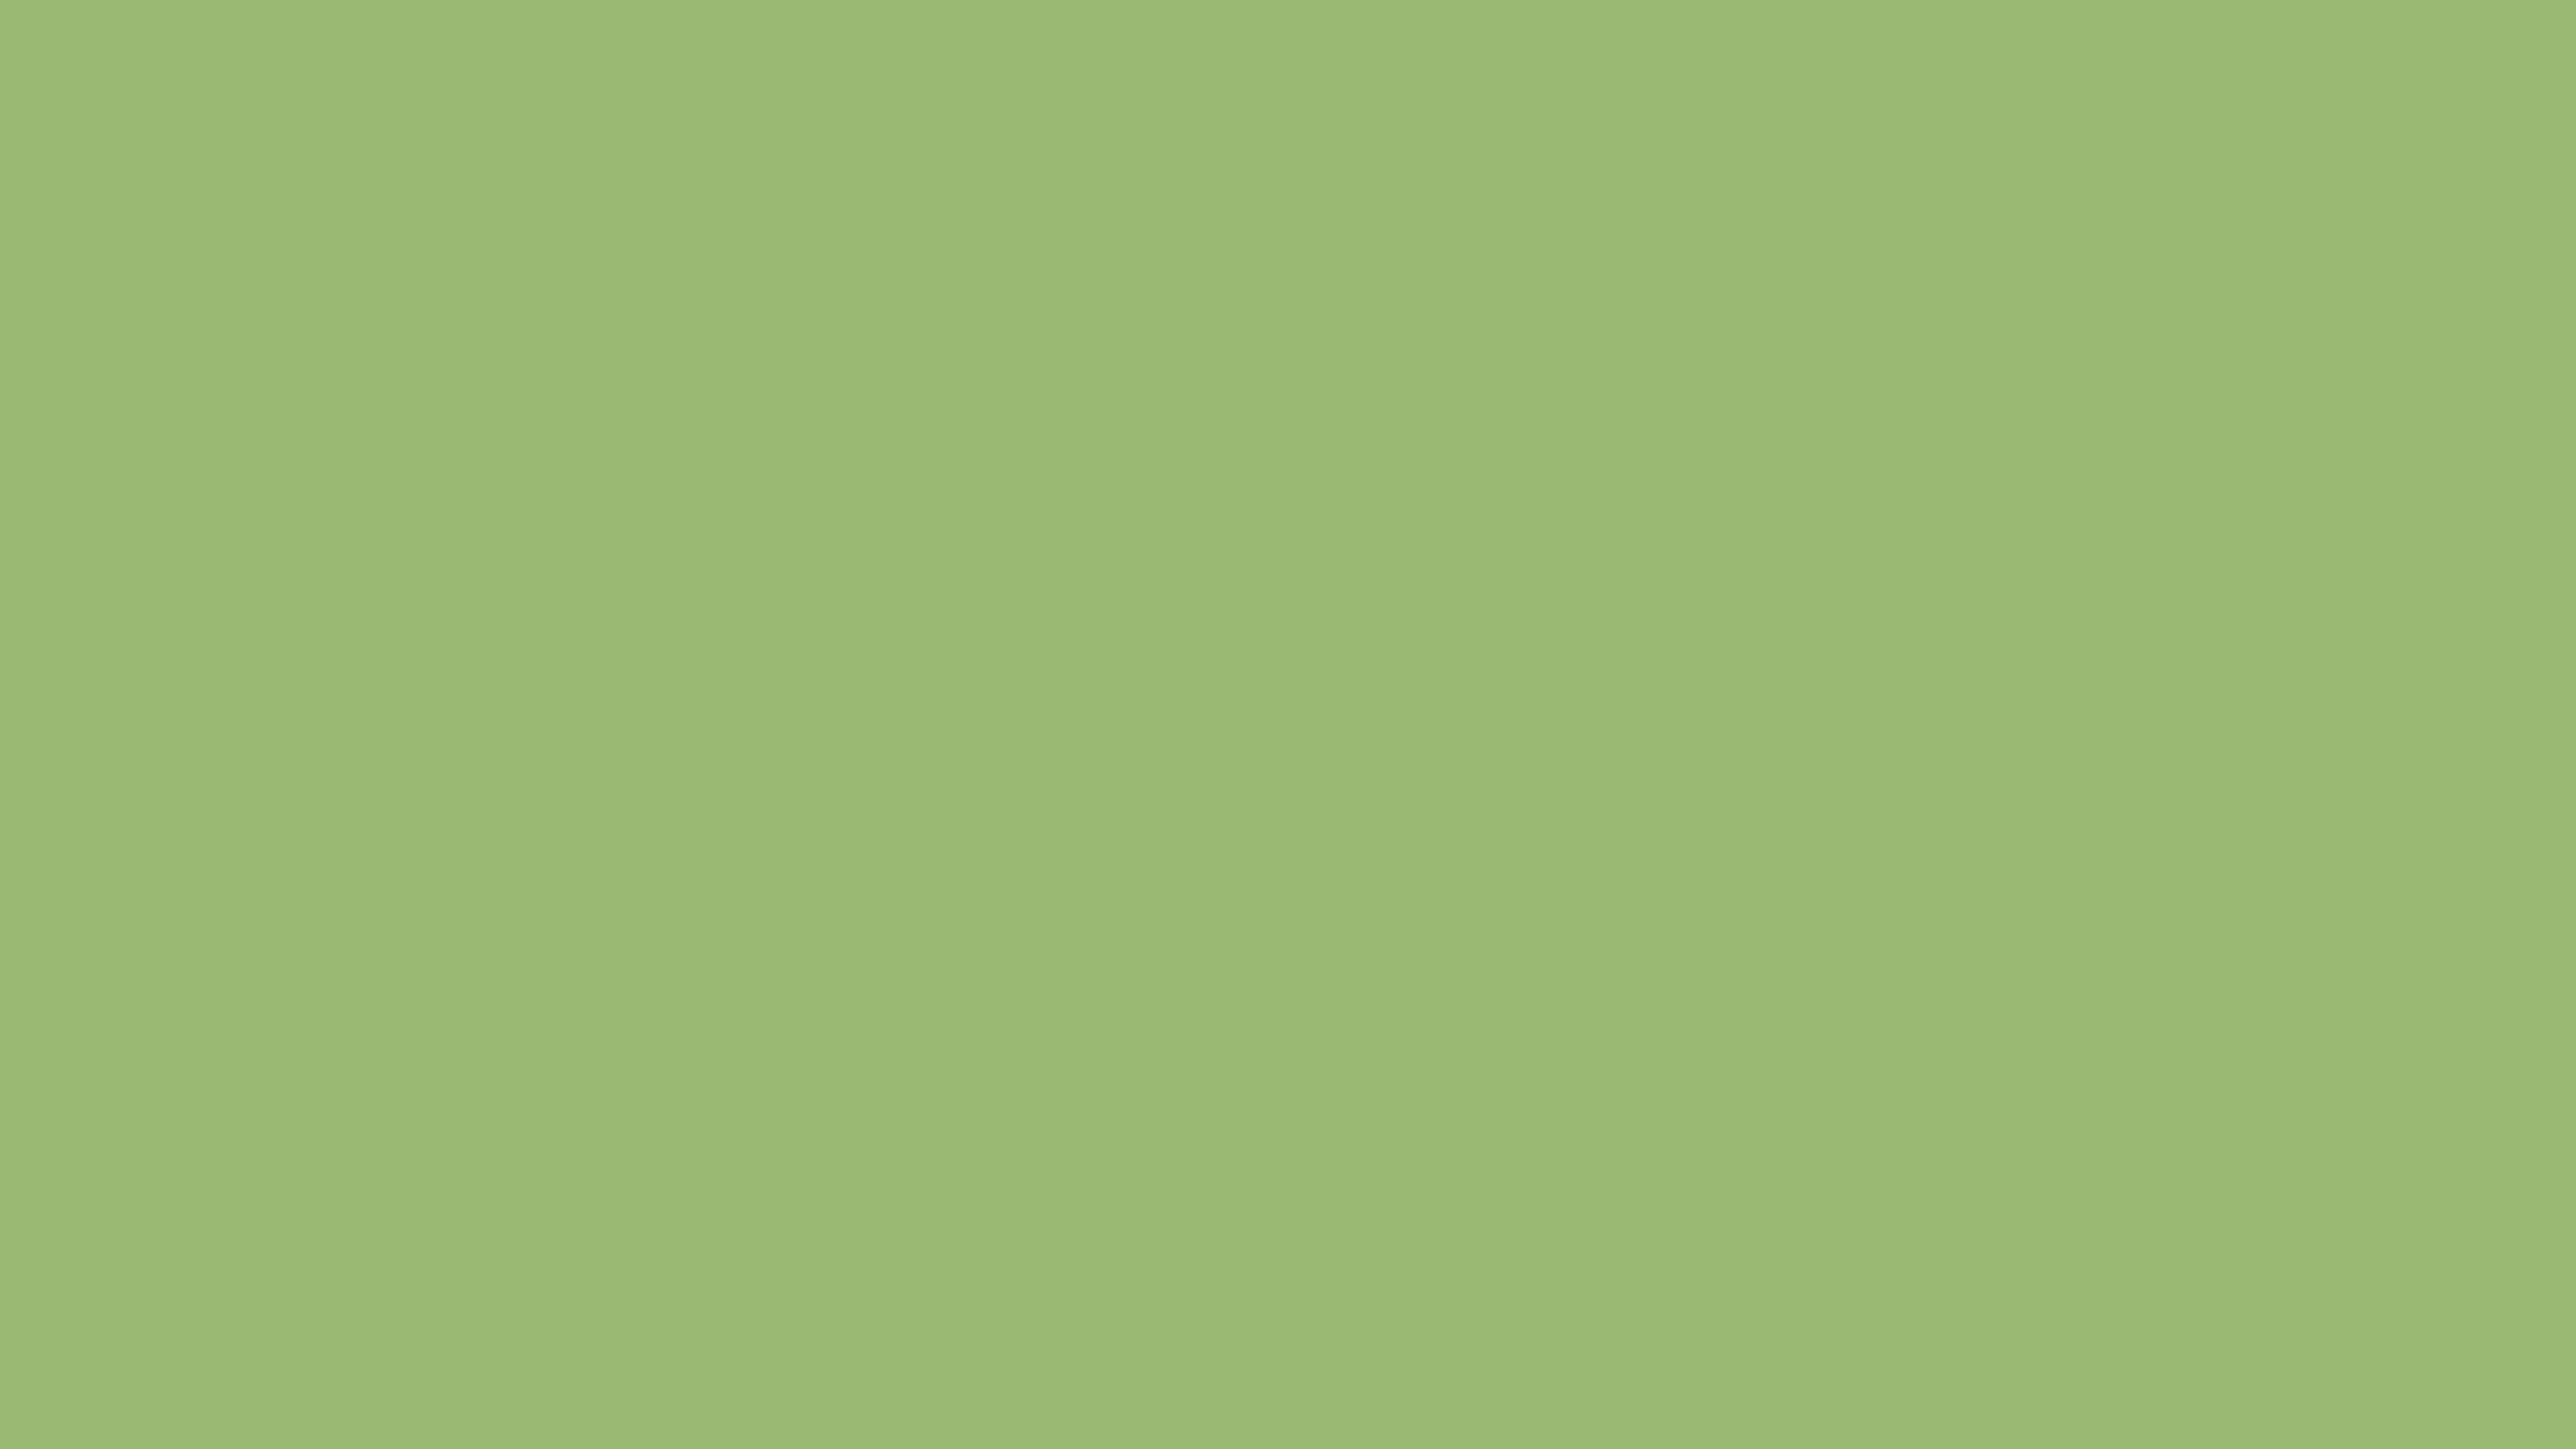 4096x2304 Olivine Solid Color Background